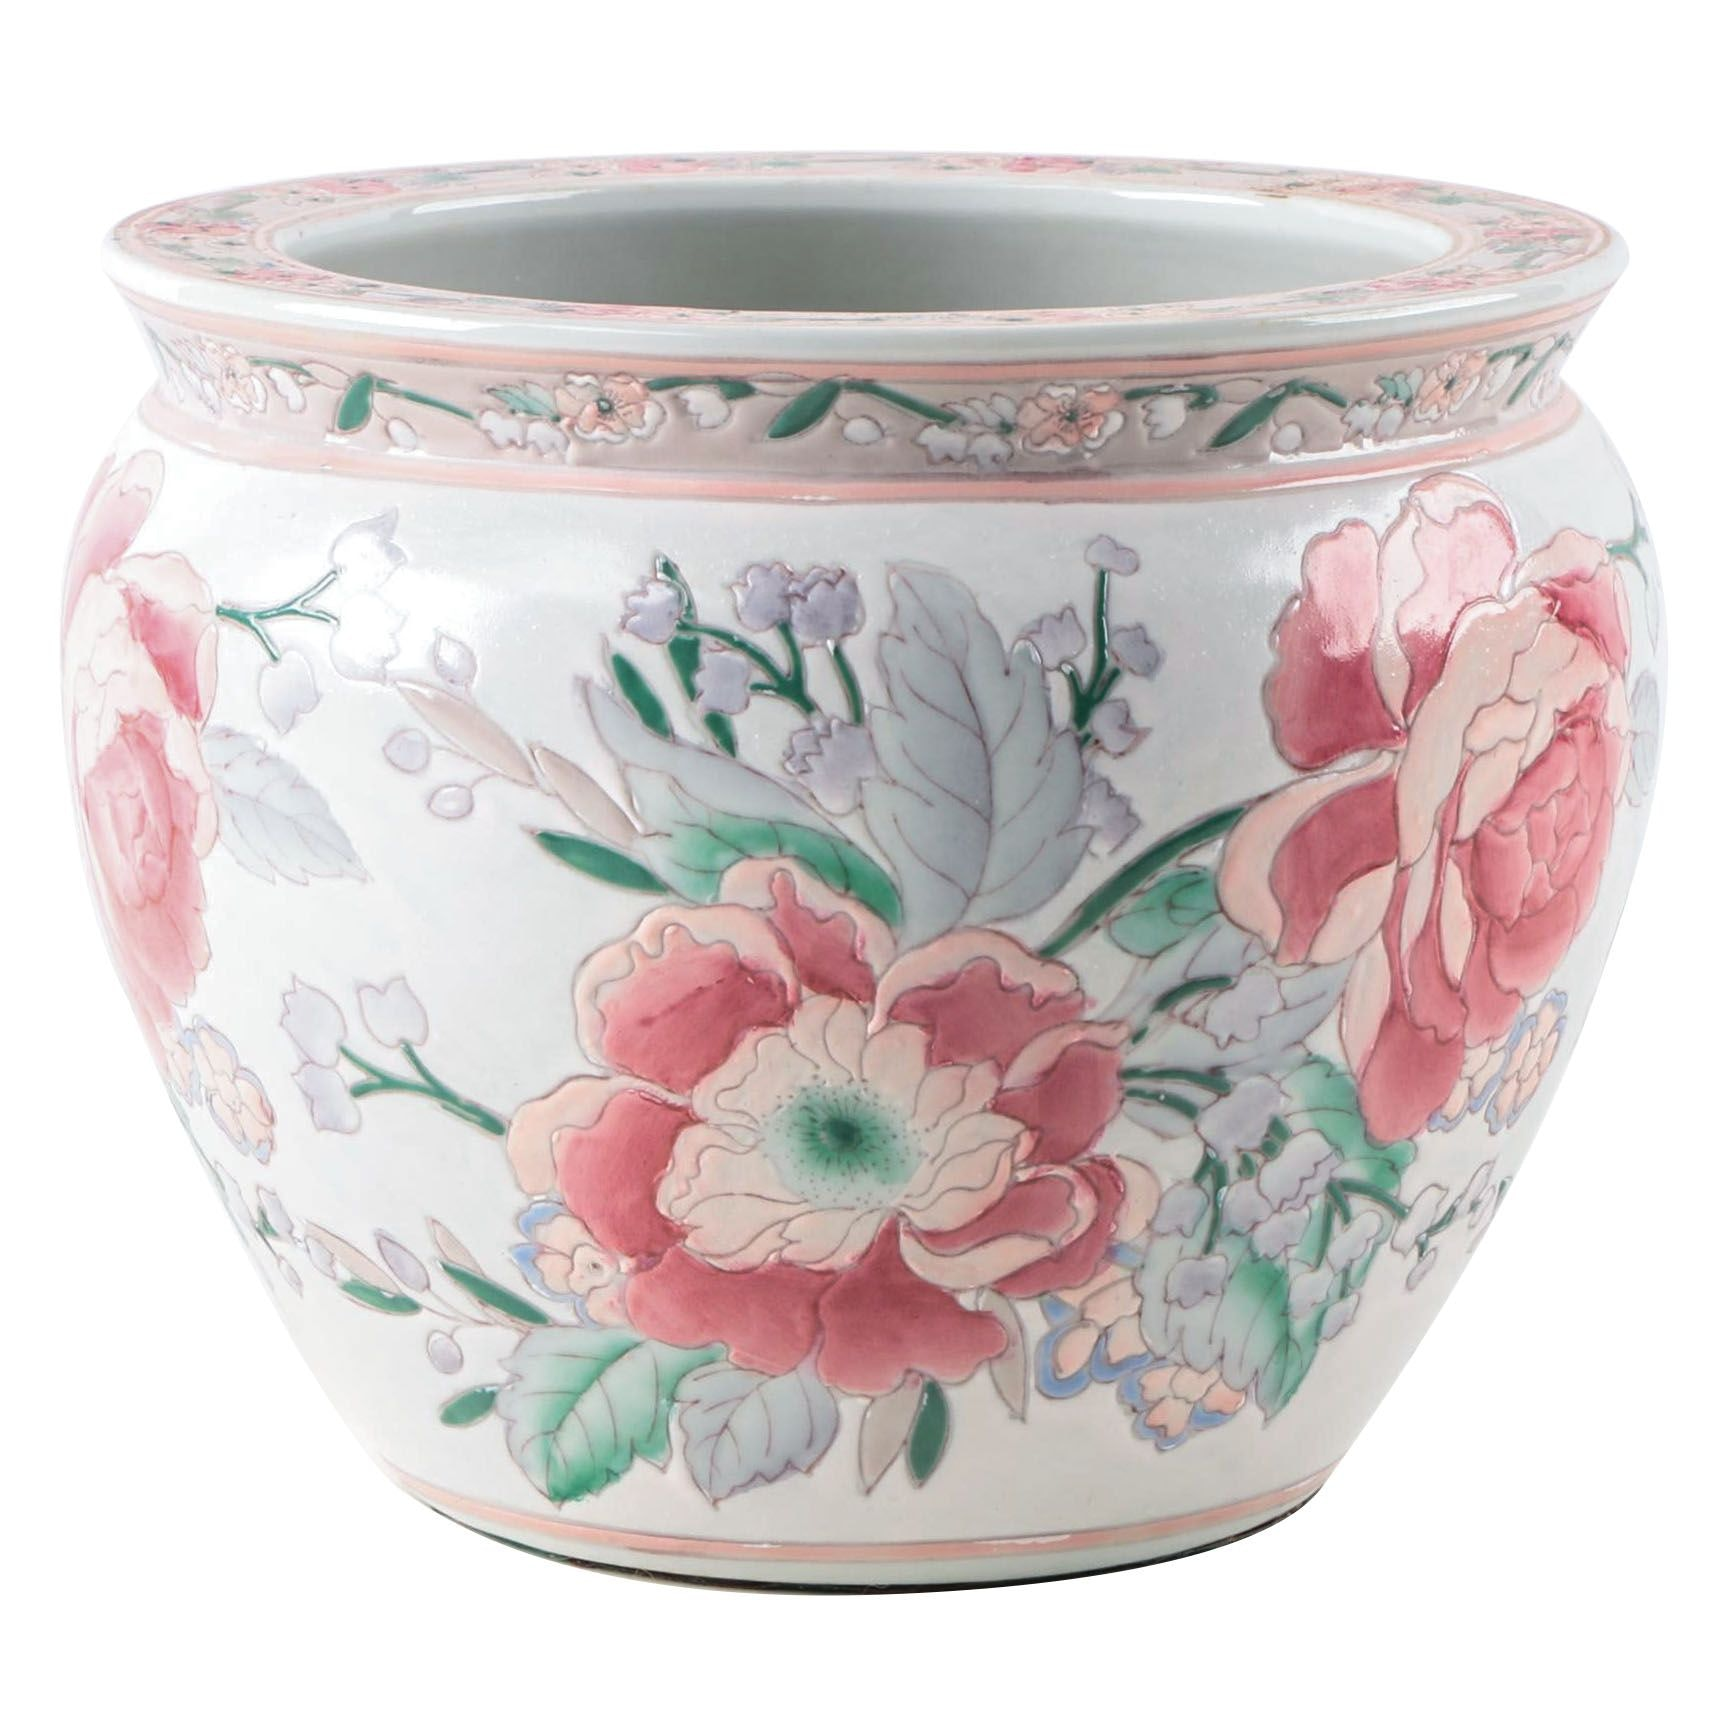 Vintage Ceramic Decorative Planter